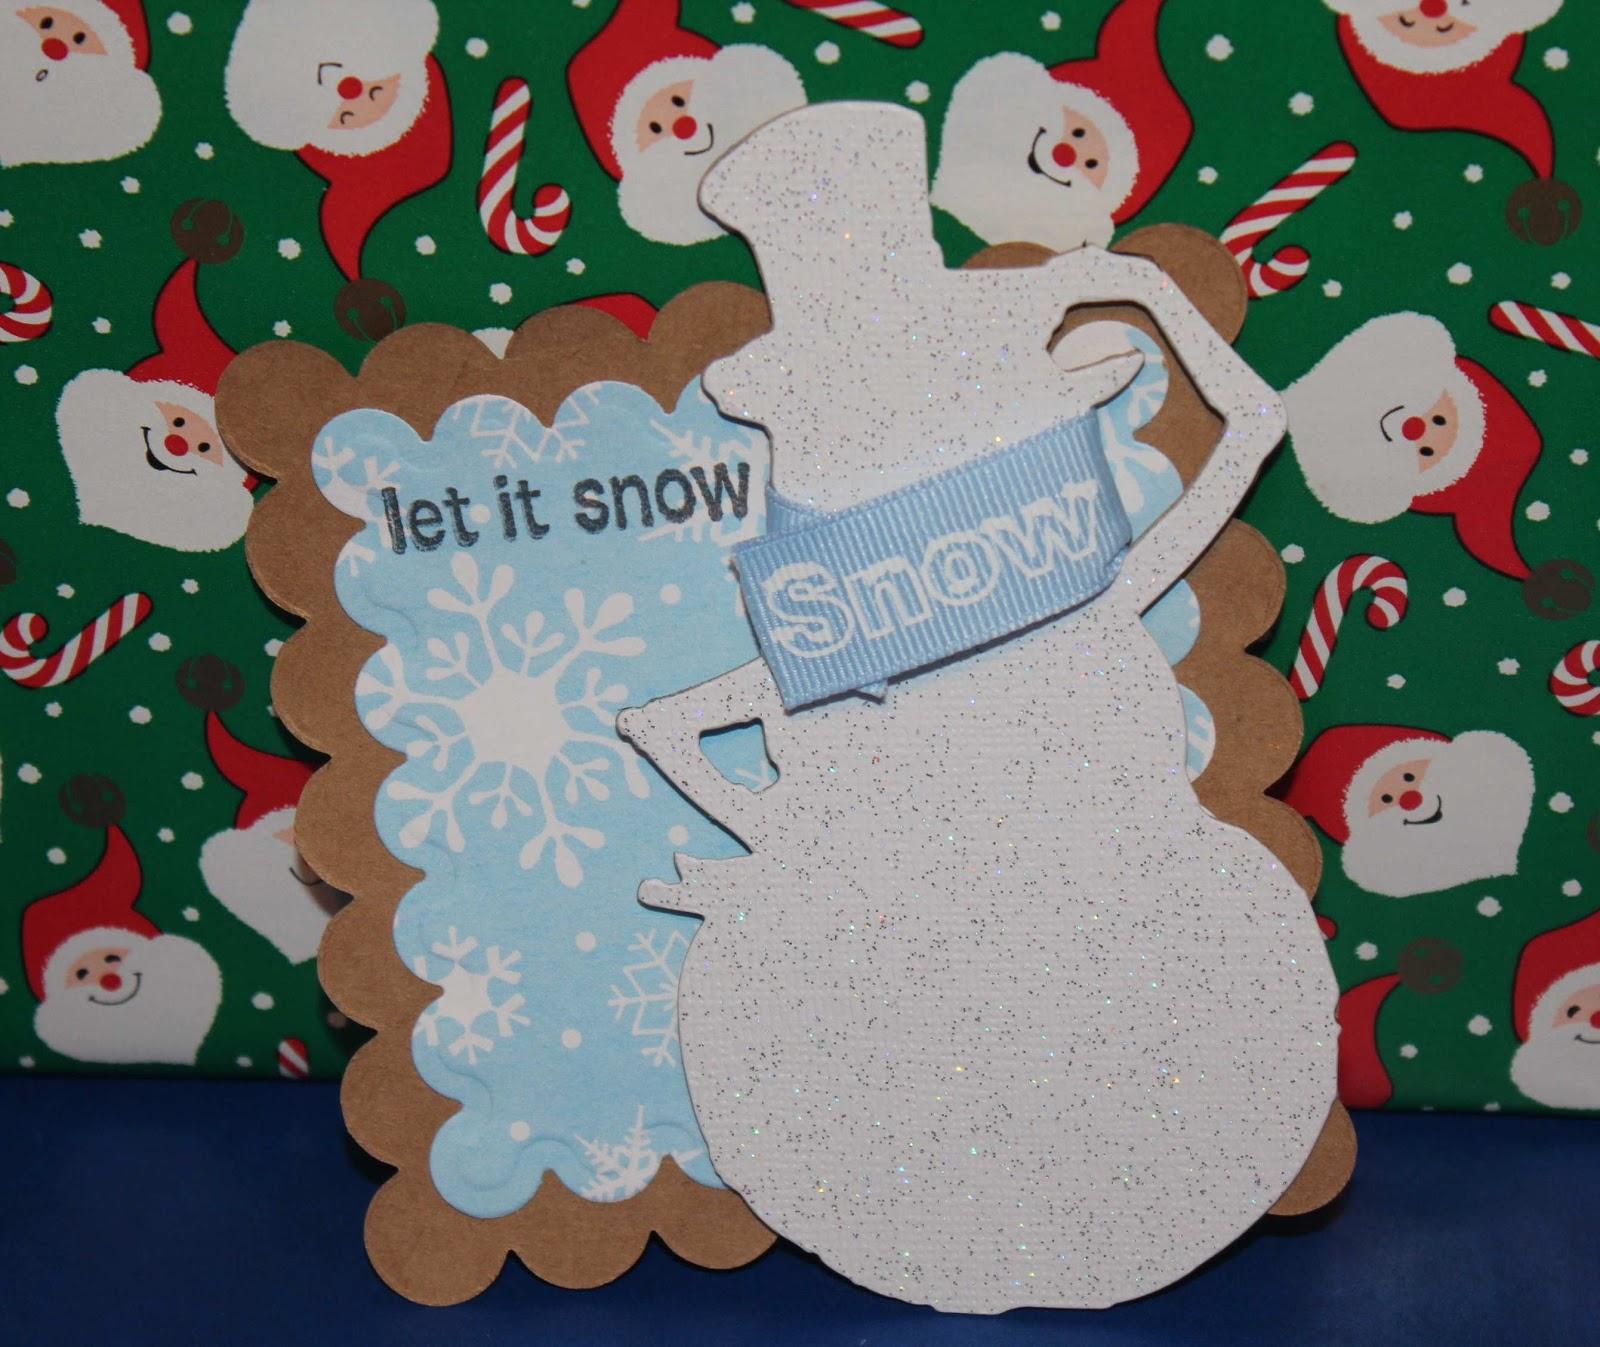 Christmas Eve Box Stencil Vintage Template Paint Card making Home Decor Art CH29